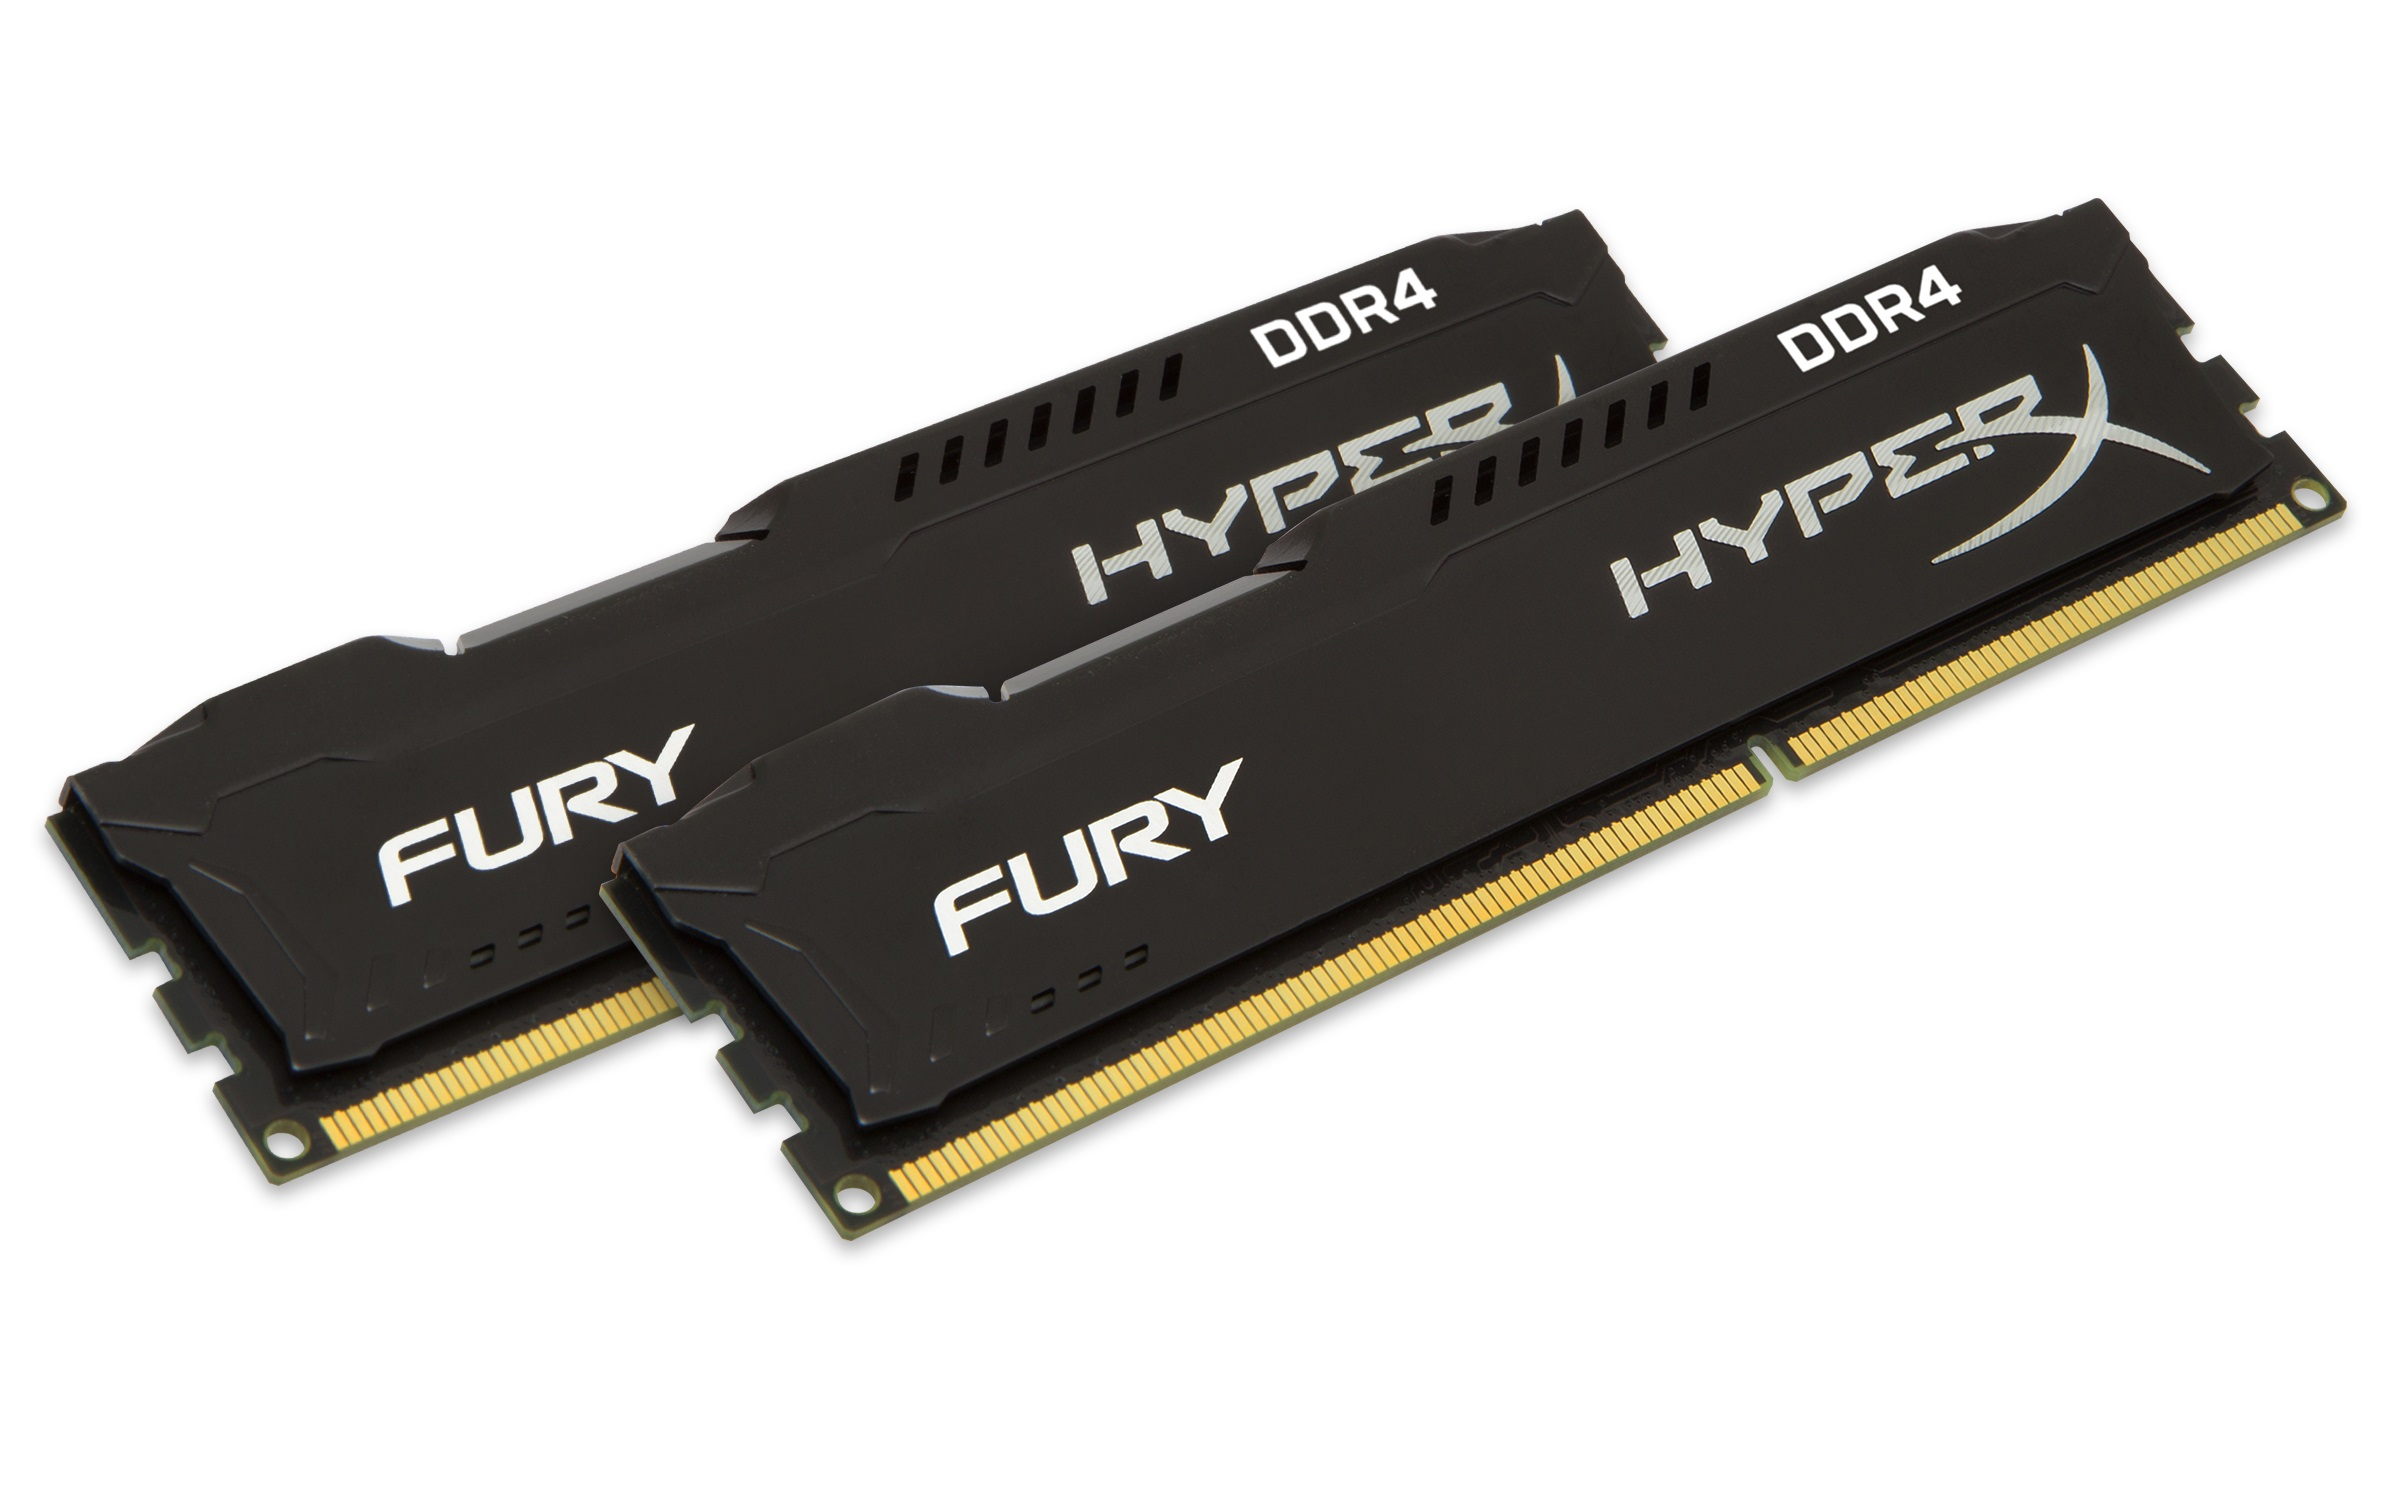 HyperX Fury Black Series 8GB(Kit of 2) 2400MHz DDR4 Non-ECC CL15 DIMM